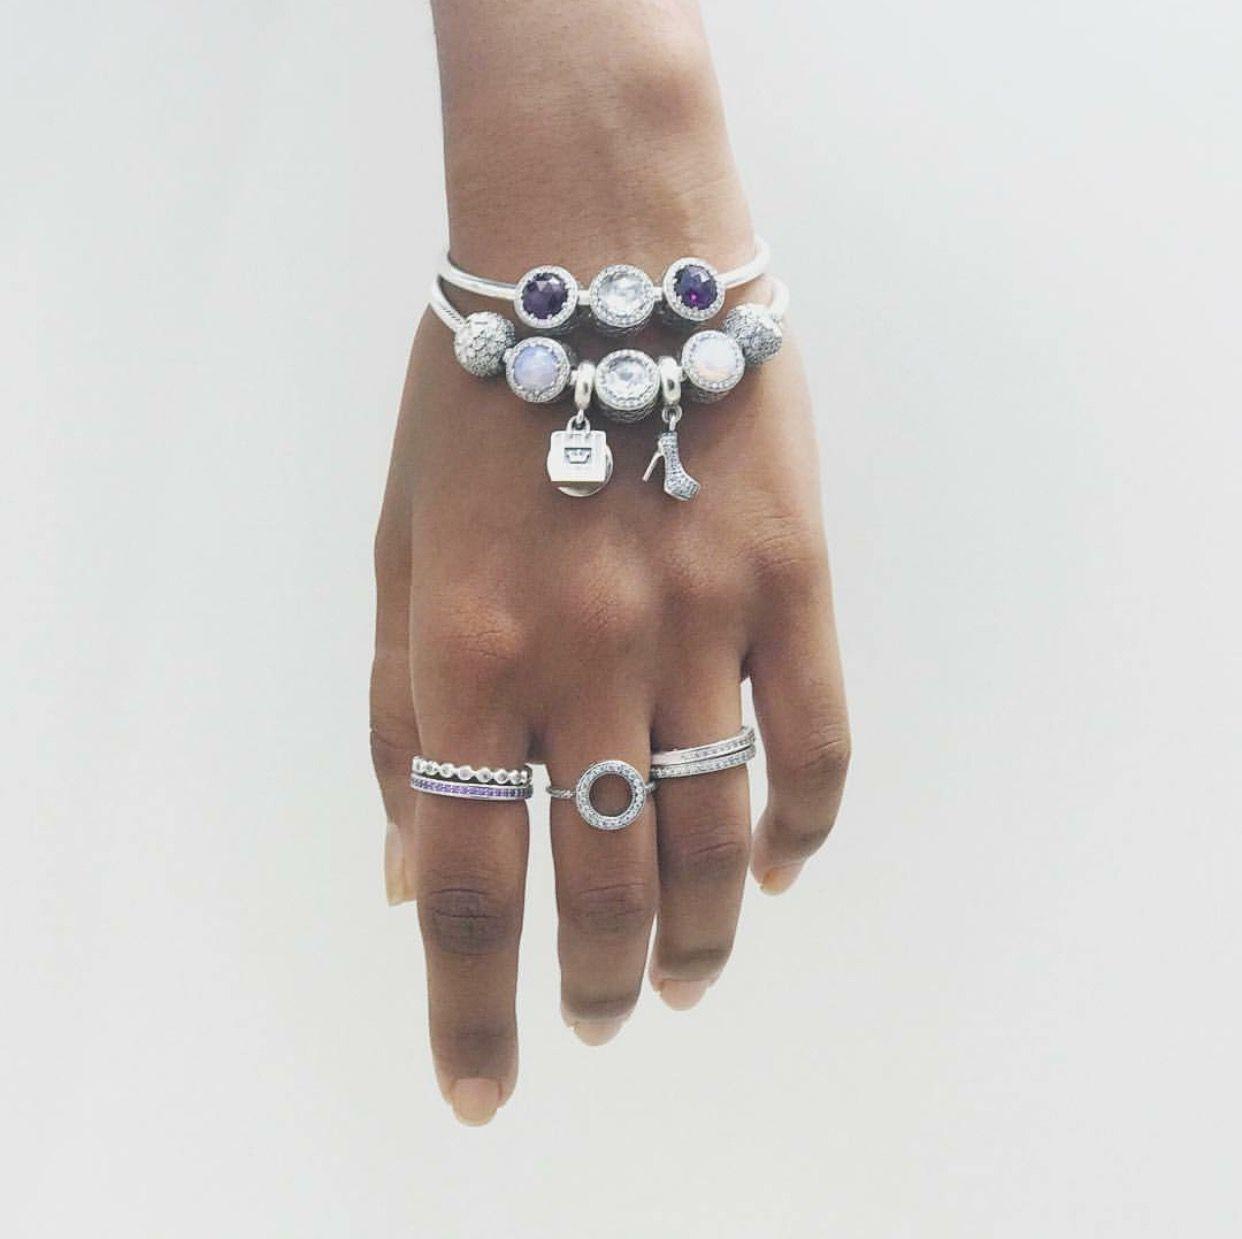 Pin by susan gilmour on sparkle pinterest bracelets pandora